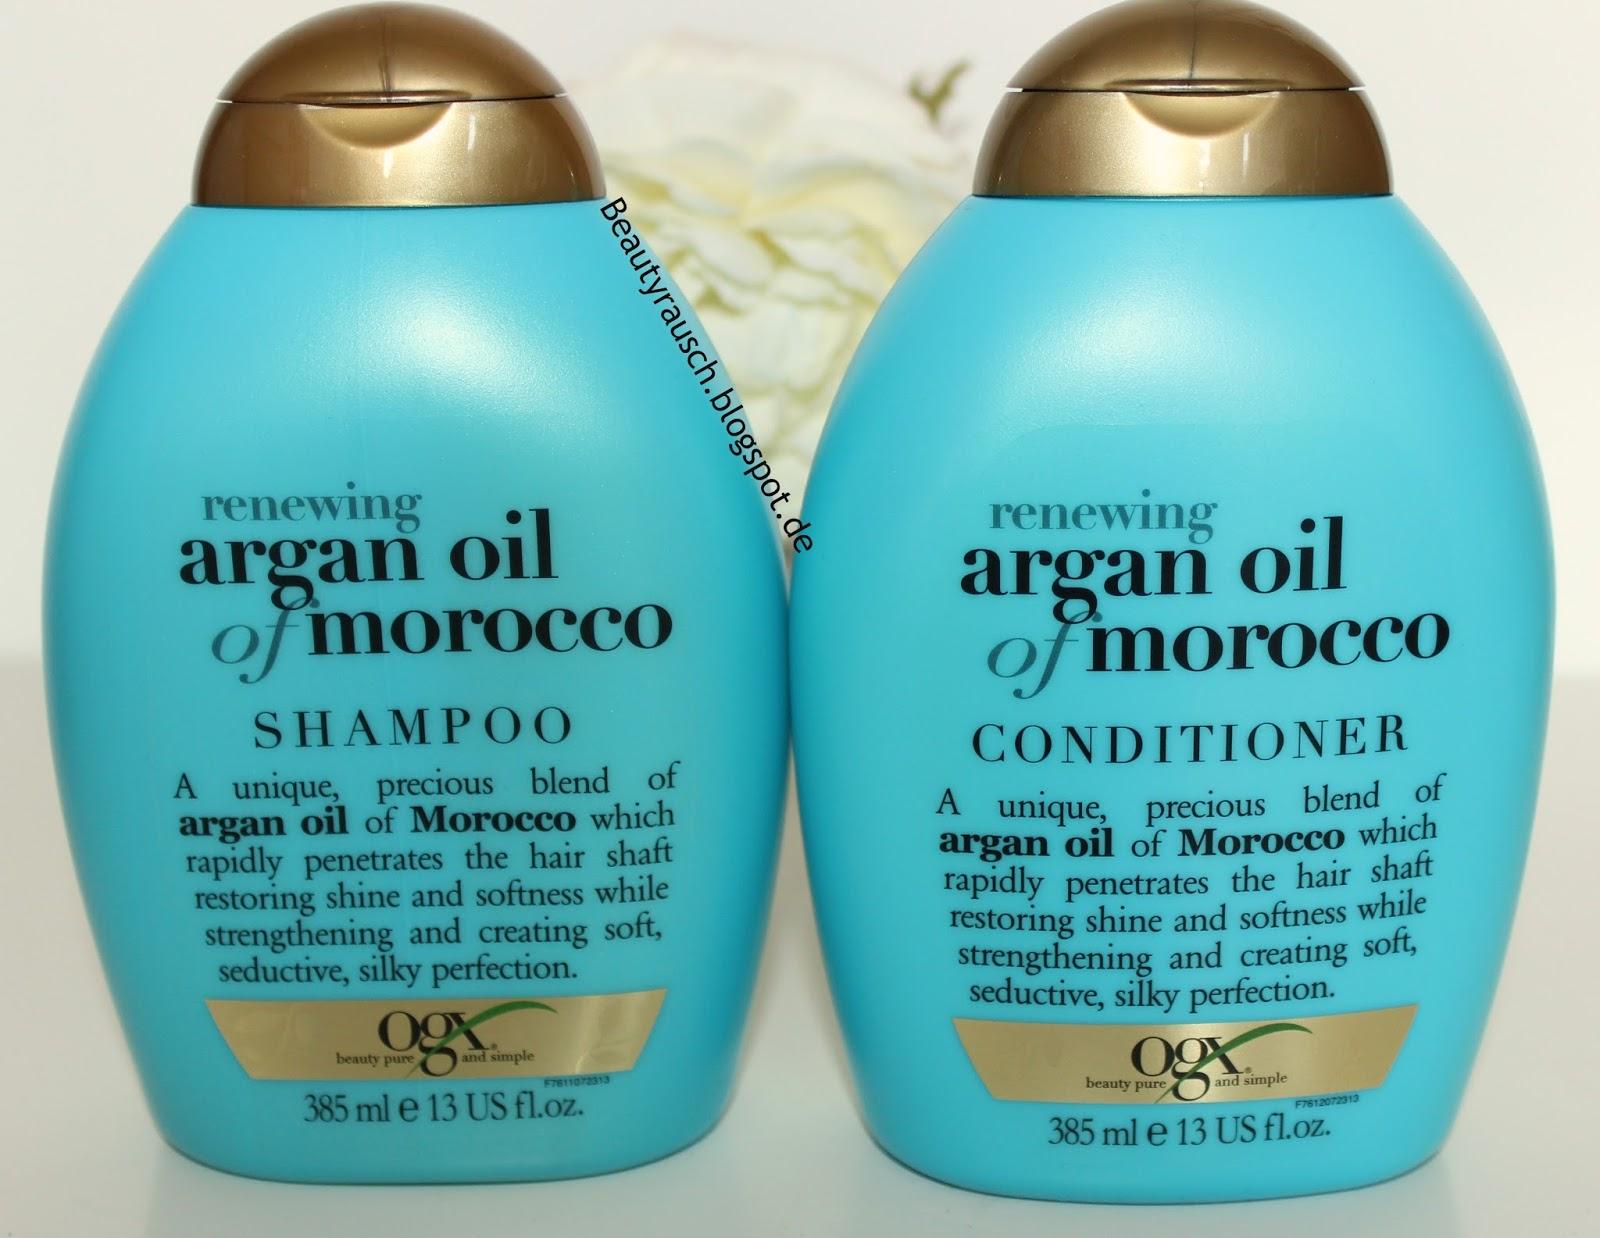 beautyrausch ogx renewing argan oil of marocco haarpflege. Black Bedroom Furniture Sets. Home Design Ideas